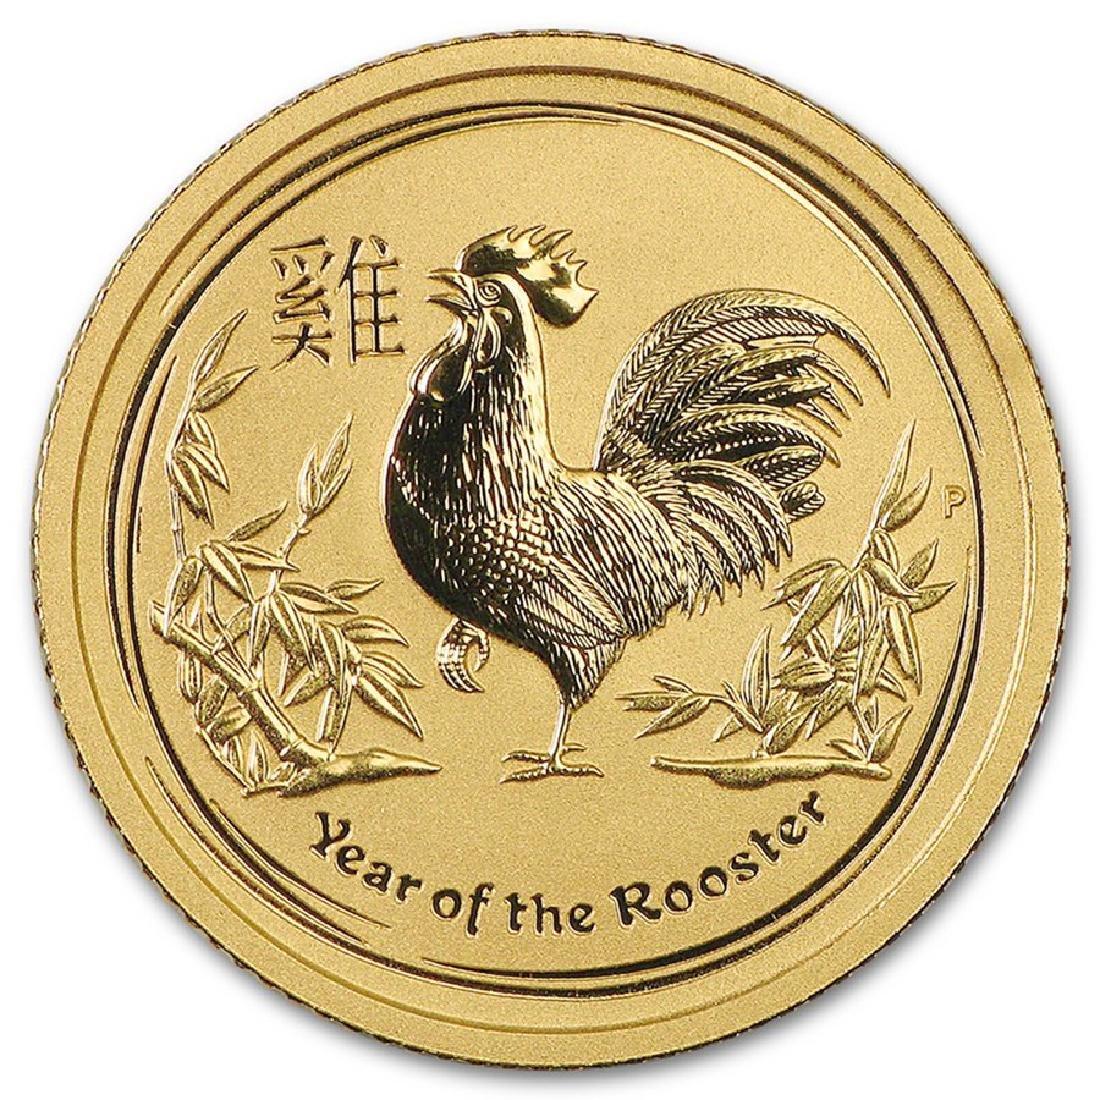 2017 Australia 1/10 oz Lunar Rooster Gold Coin